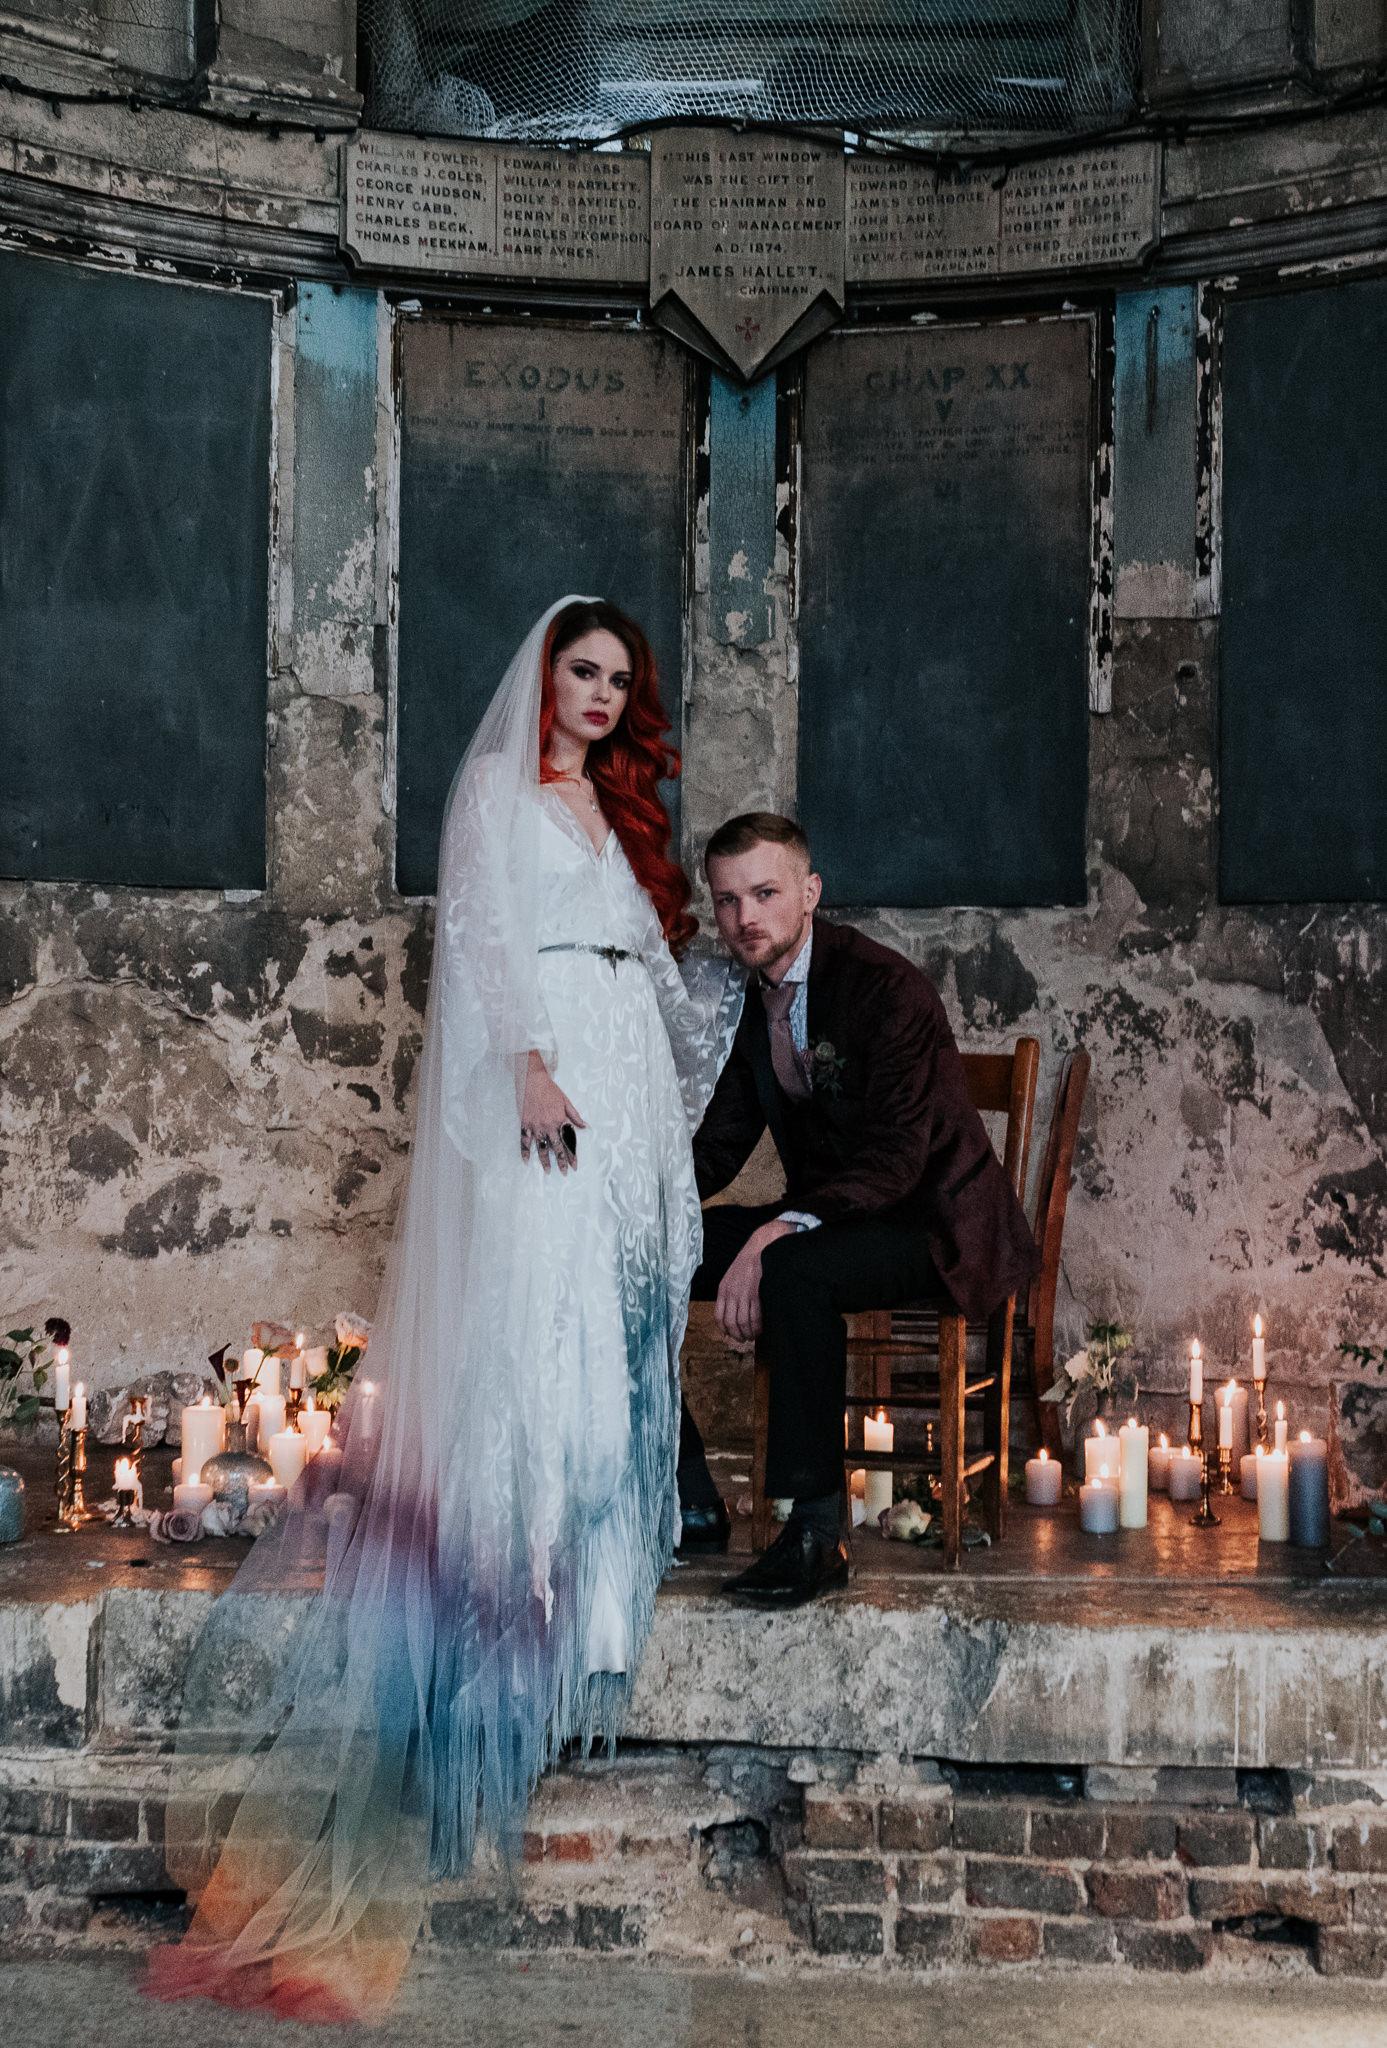 alternative chapel wedding- asylum london- unique london wedding venue- london wedding venue- Jenny Appleton Photography- chapel wedding- gothic wedding venue